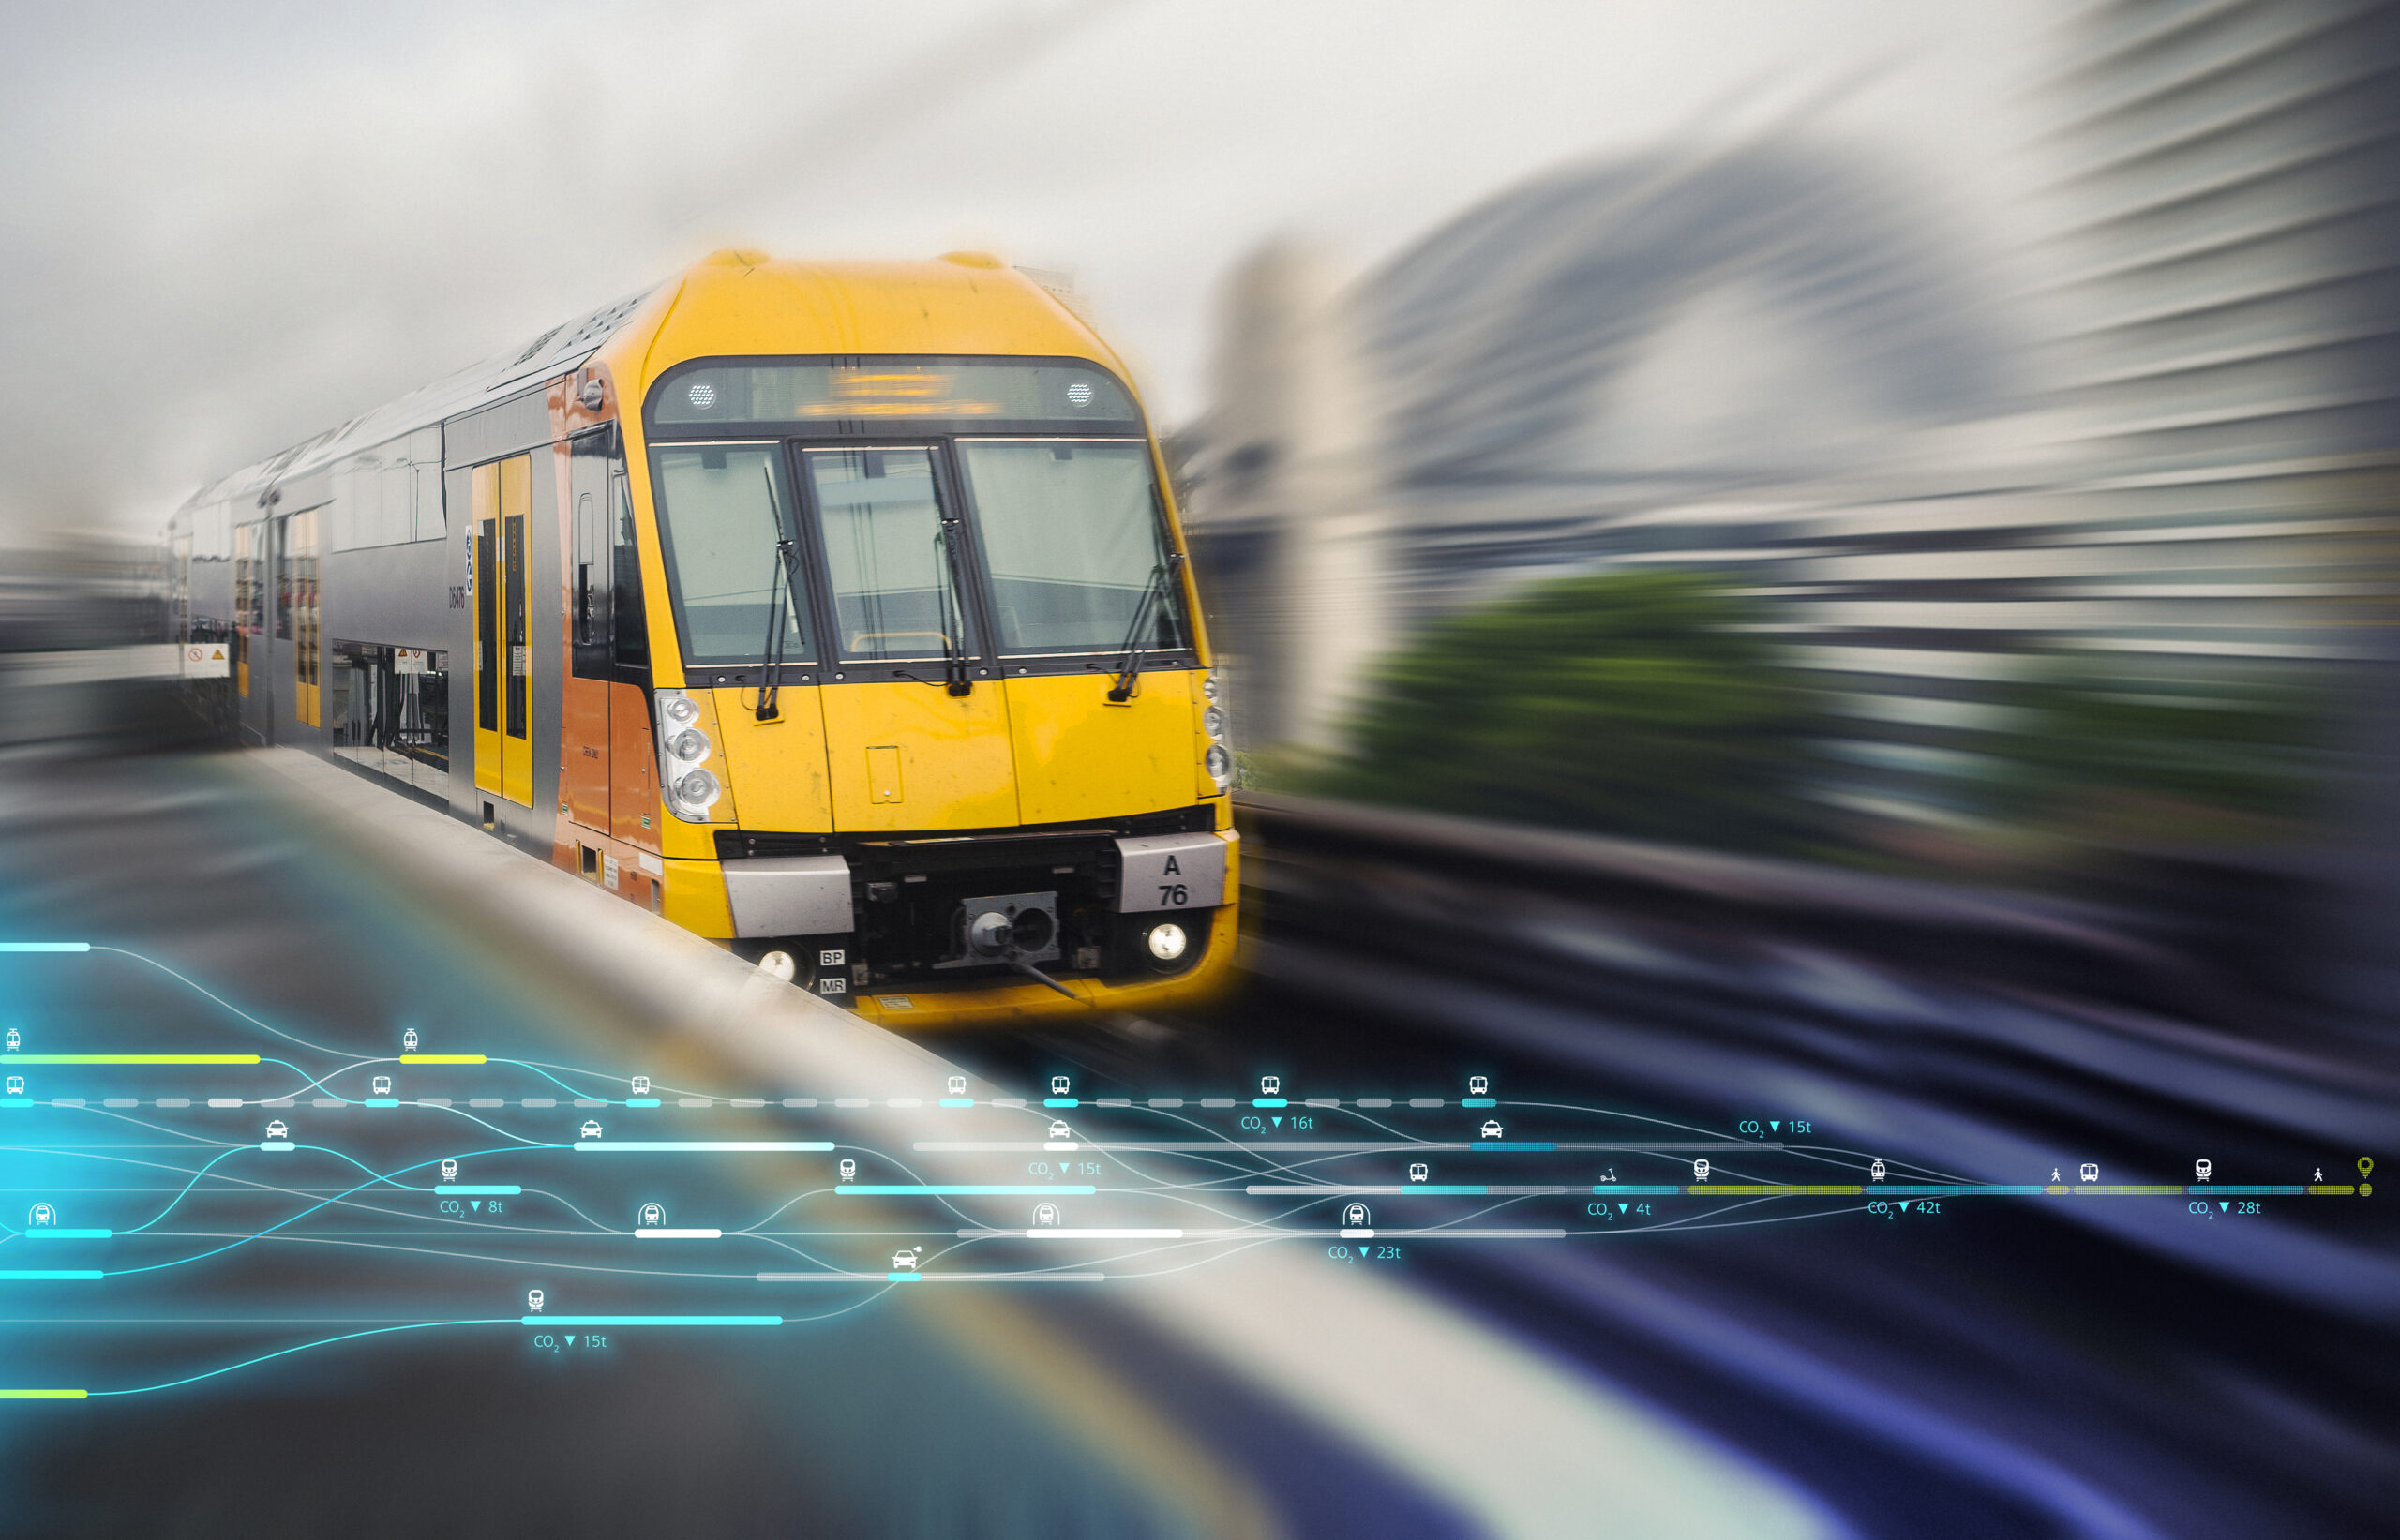 A train on Sydney's rail network